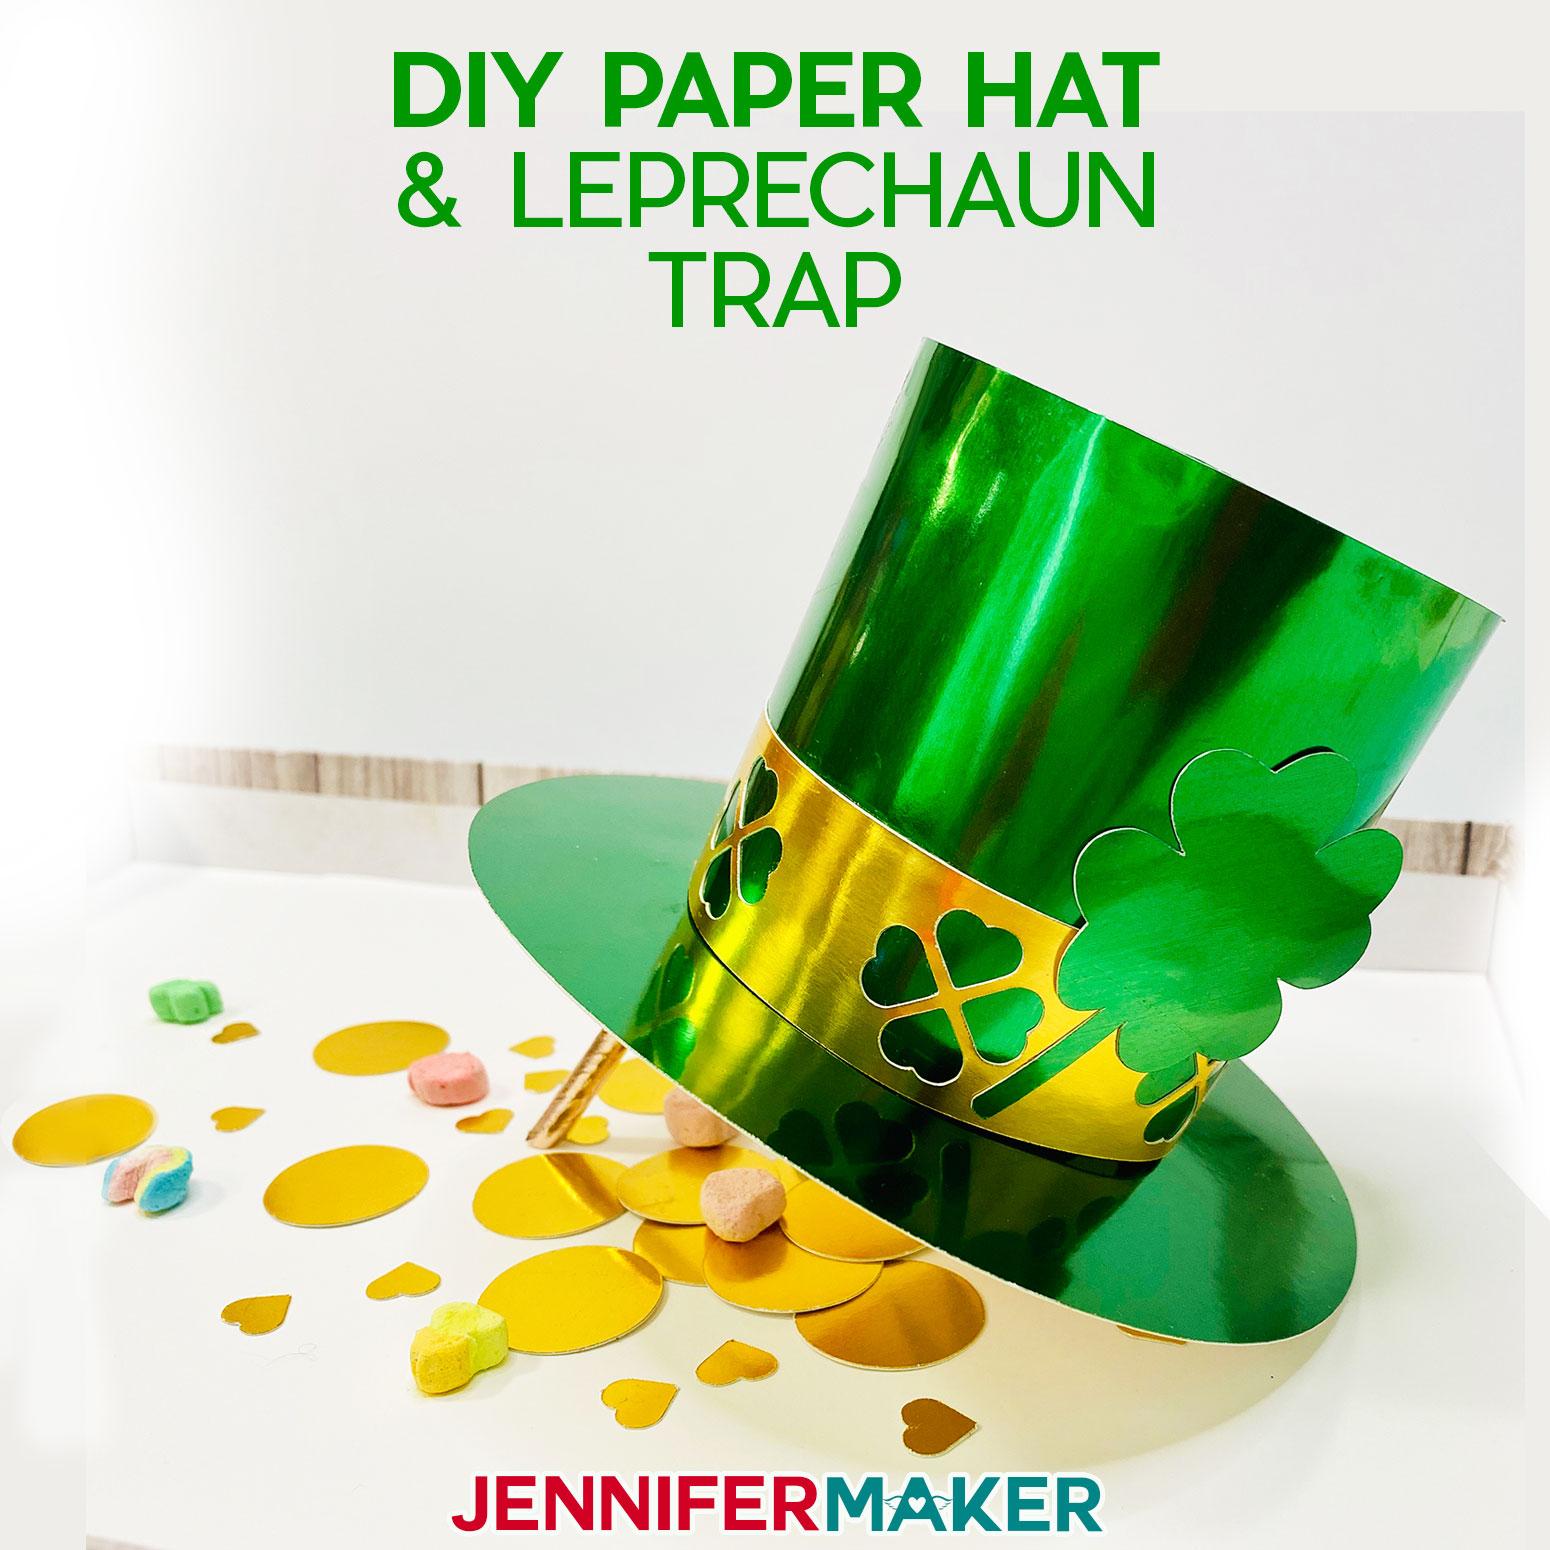 DIY Paper Hat & Leprechaun Hat Tutorial